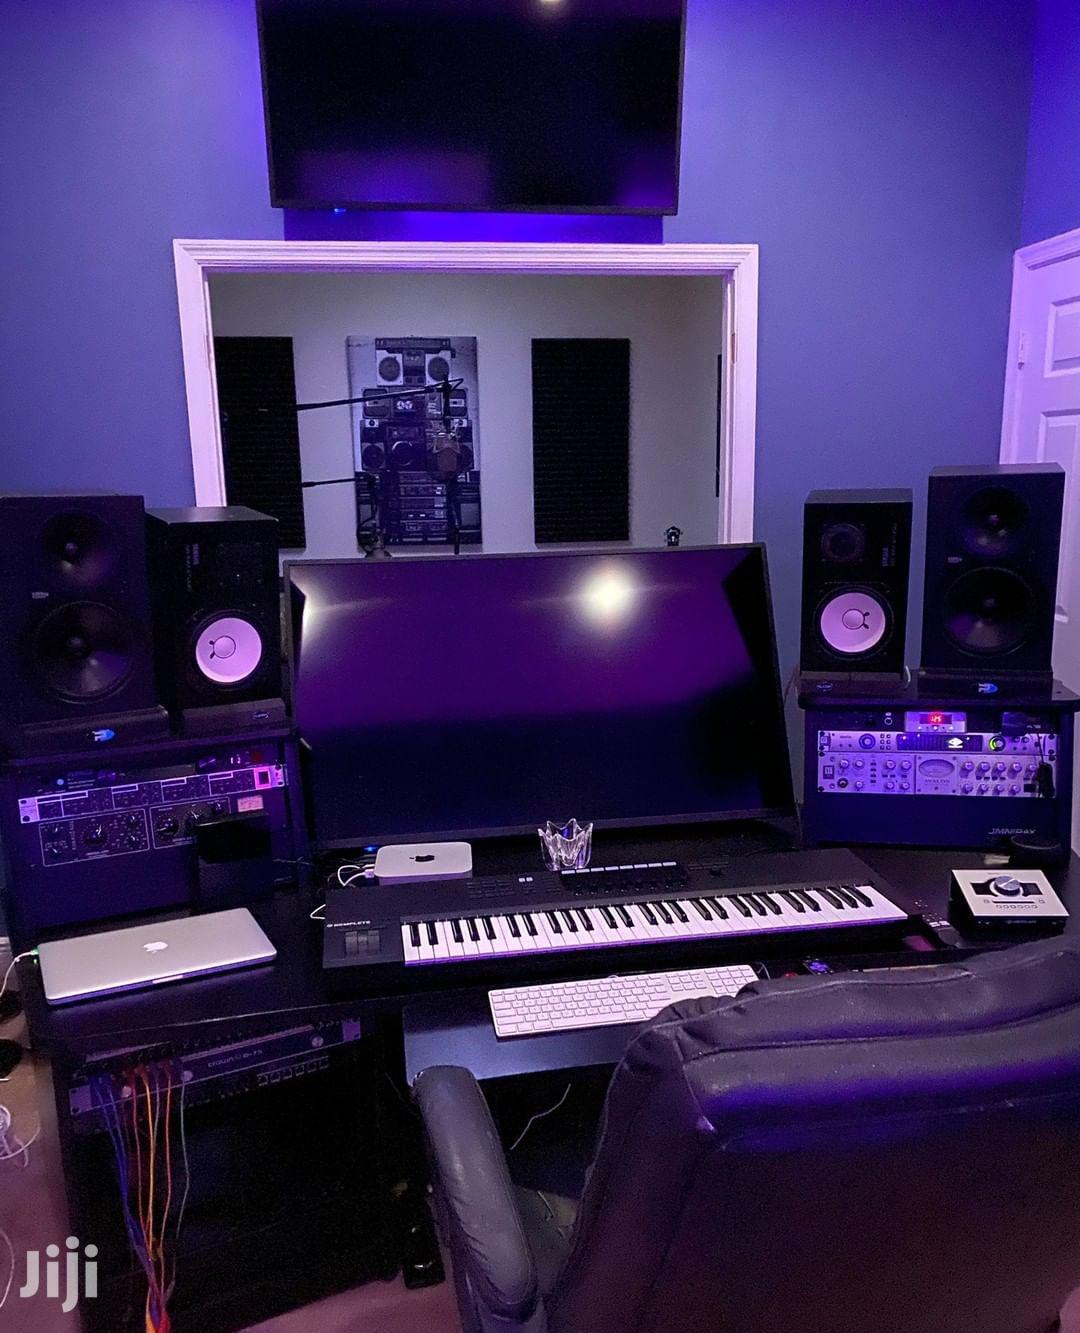 Archive: Recording Studio Promo?!